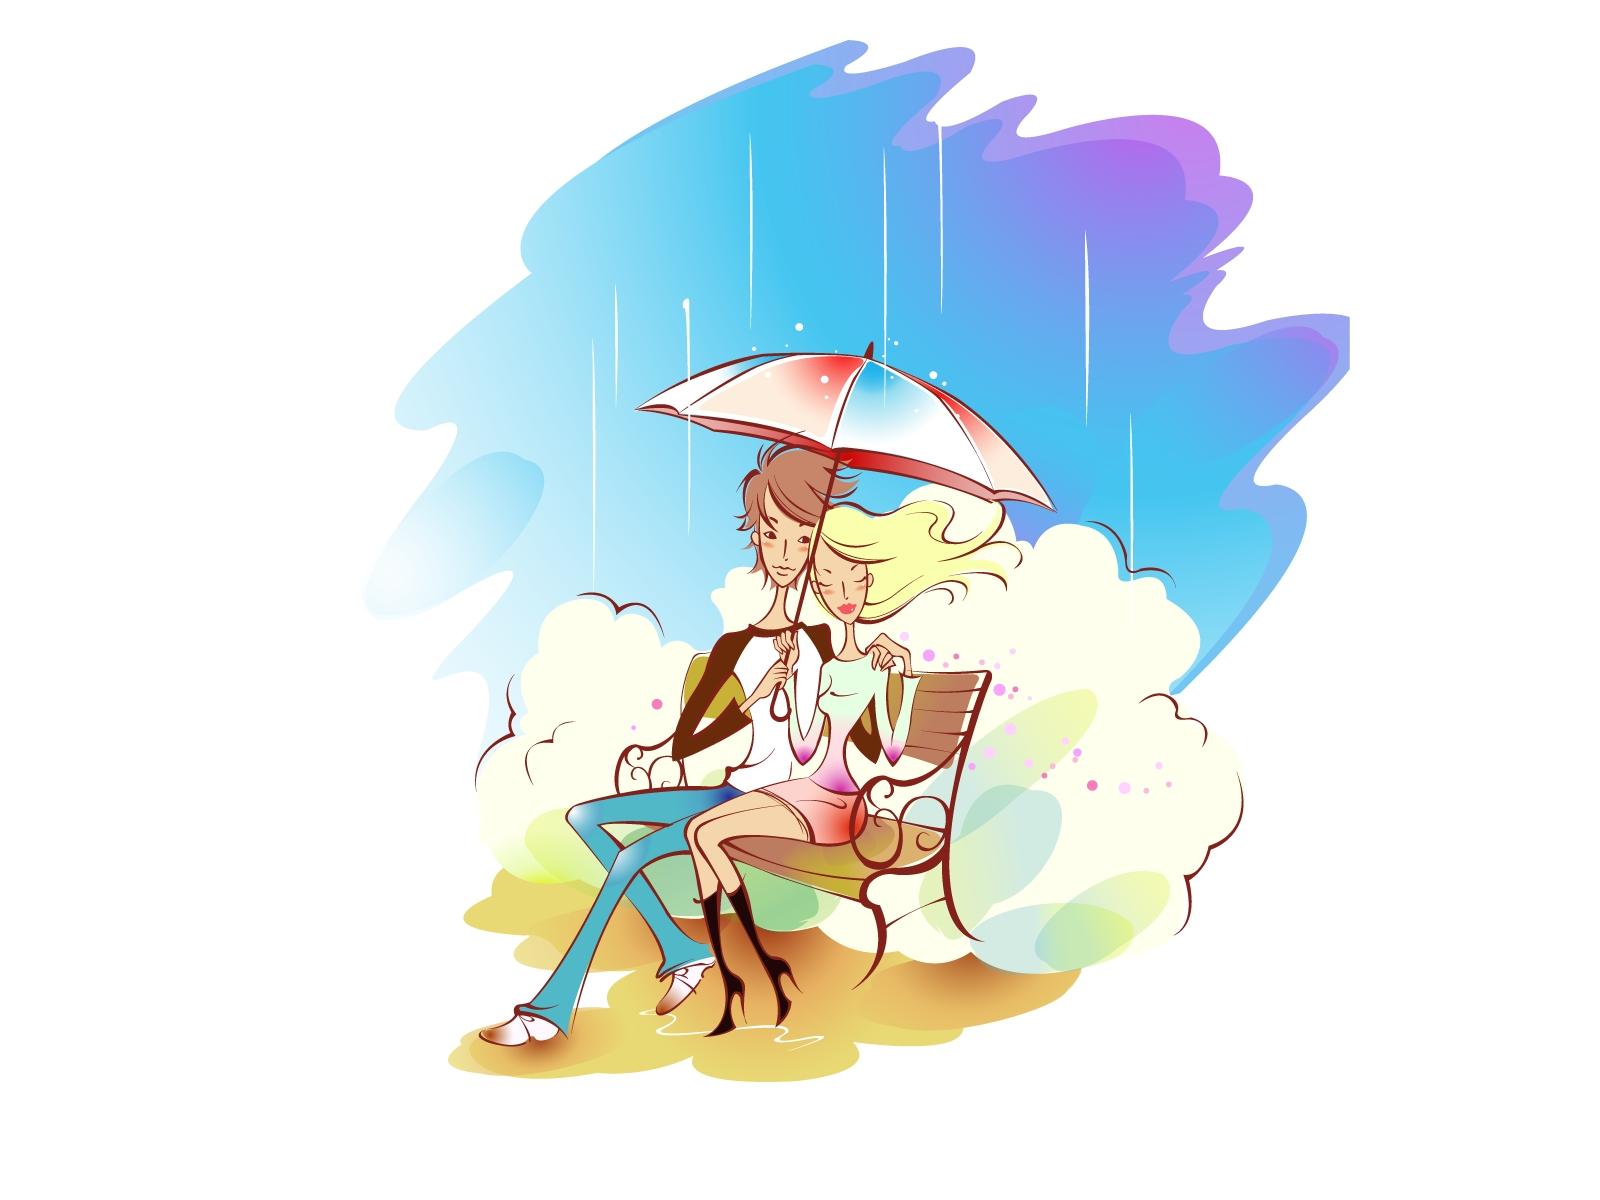 Wallpaper Drawing Illustration Love Rain Umbrella Cartoon